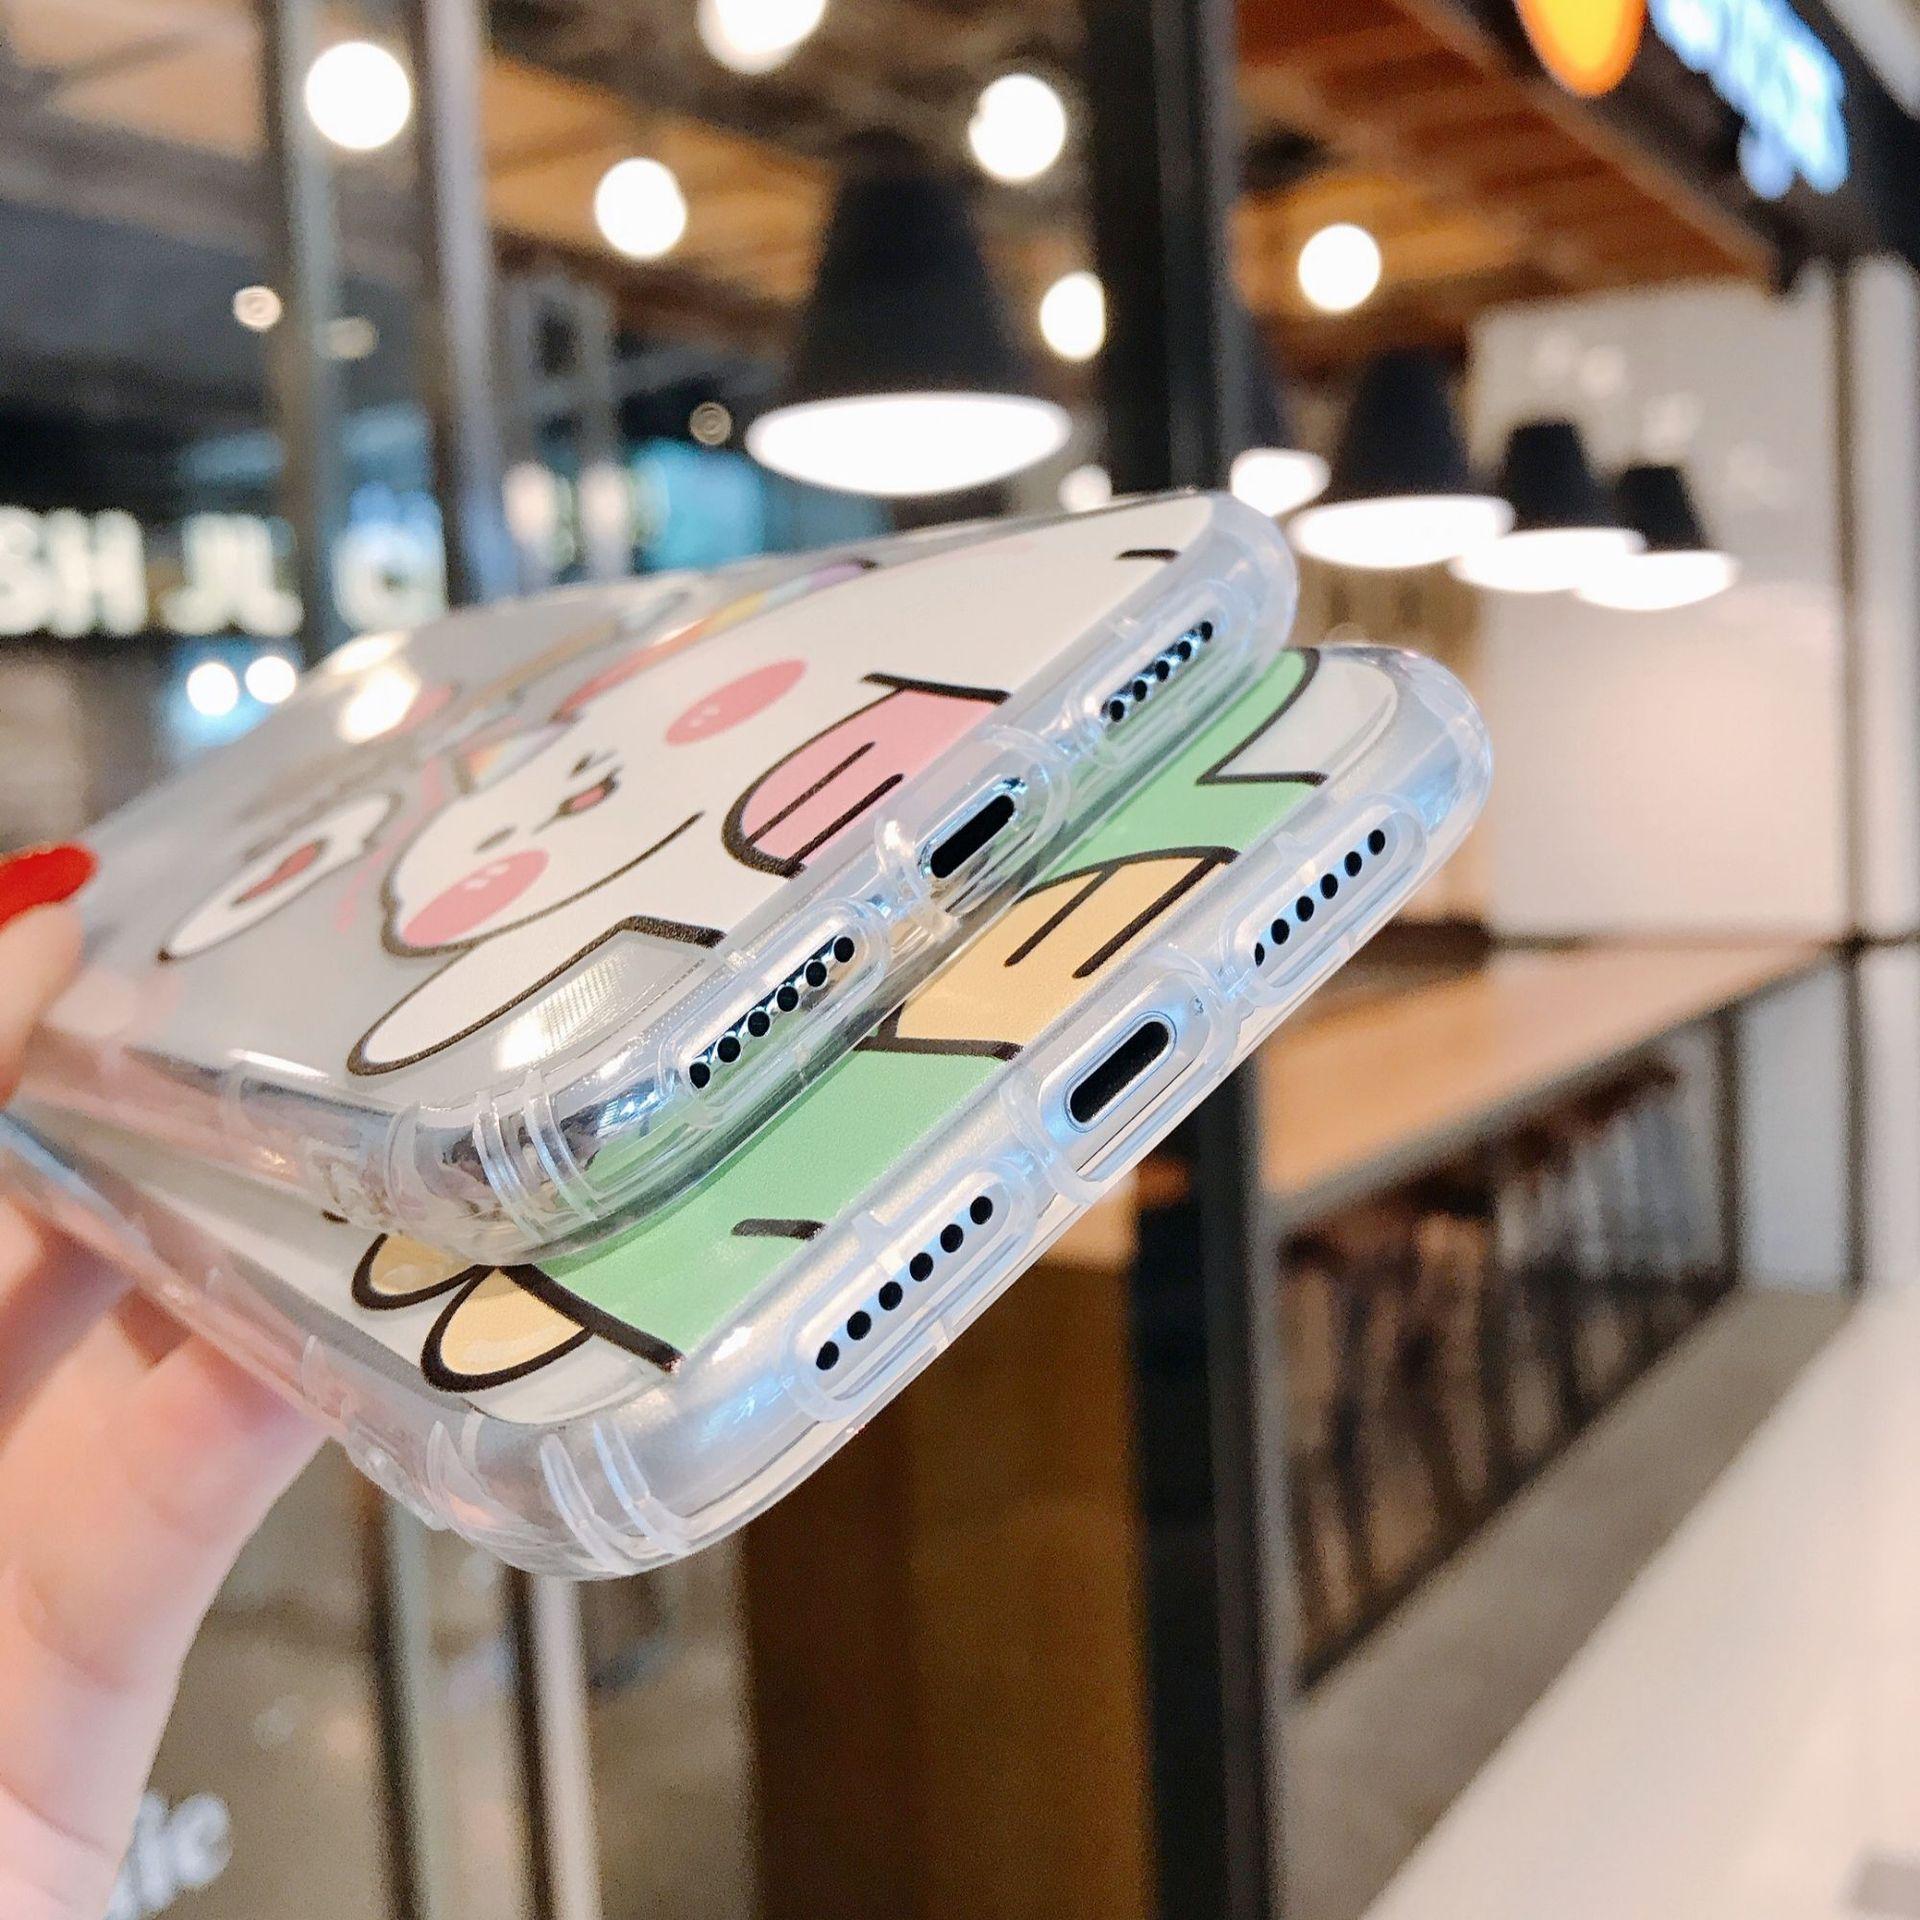 mobile accessories phone case